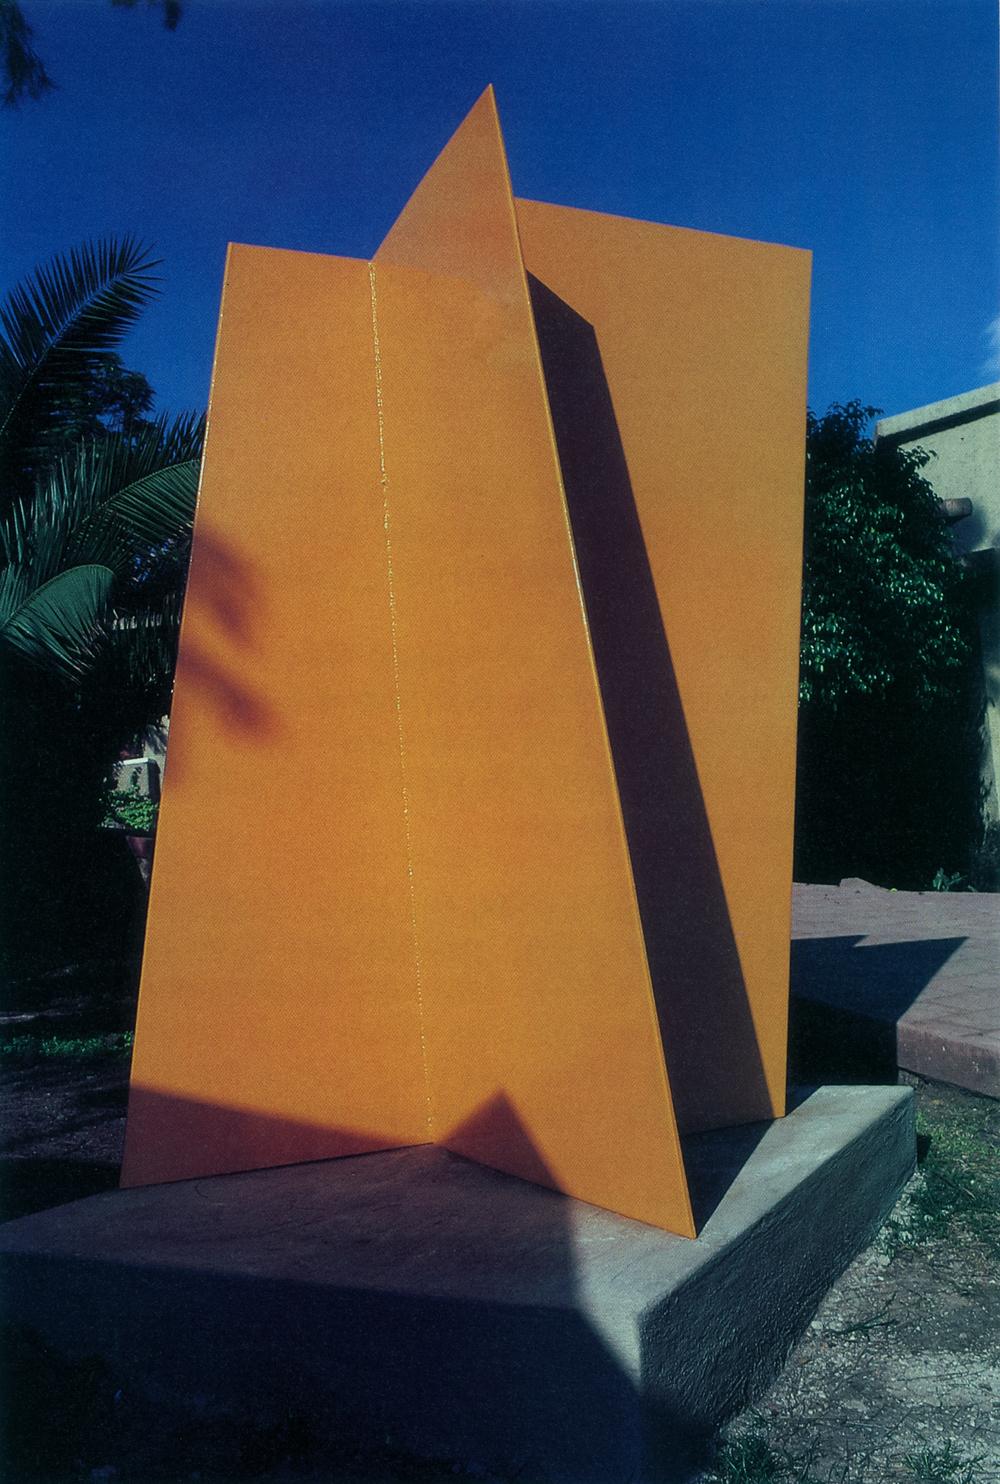 Villas Buenaventura Sculpture Garden, San Juan Cosala, Mexico; 1991.  Puerta de Sol.  6' x 5' x 3'.